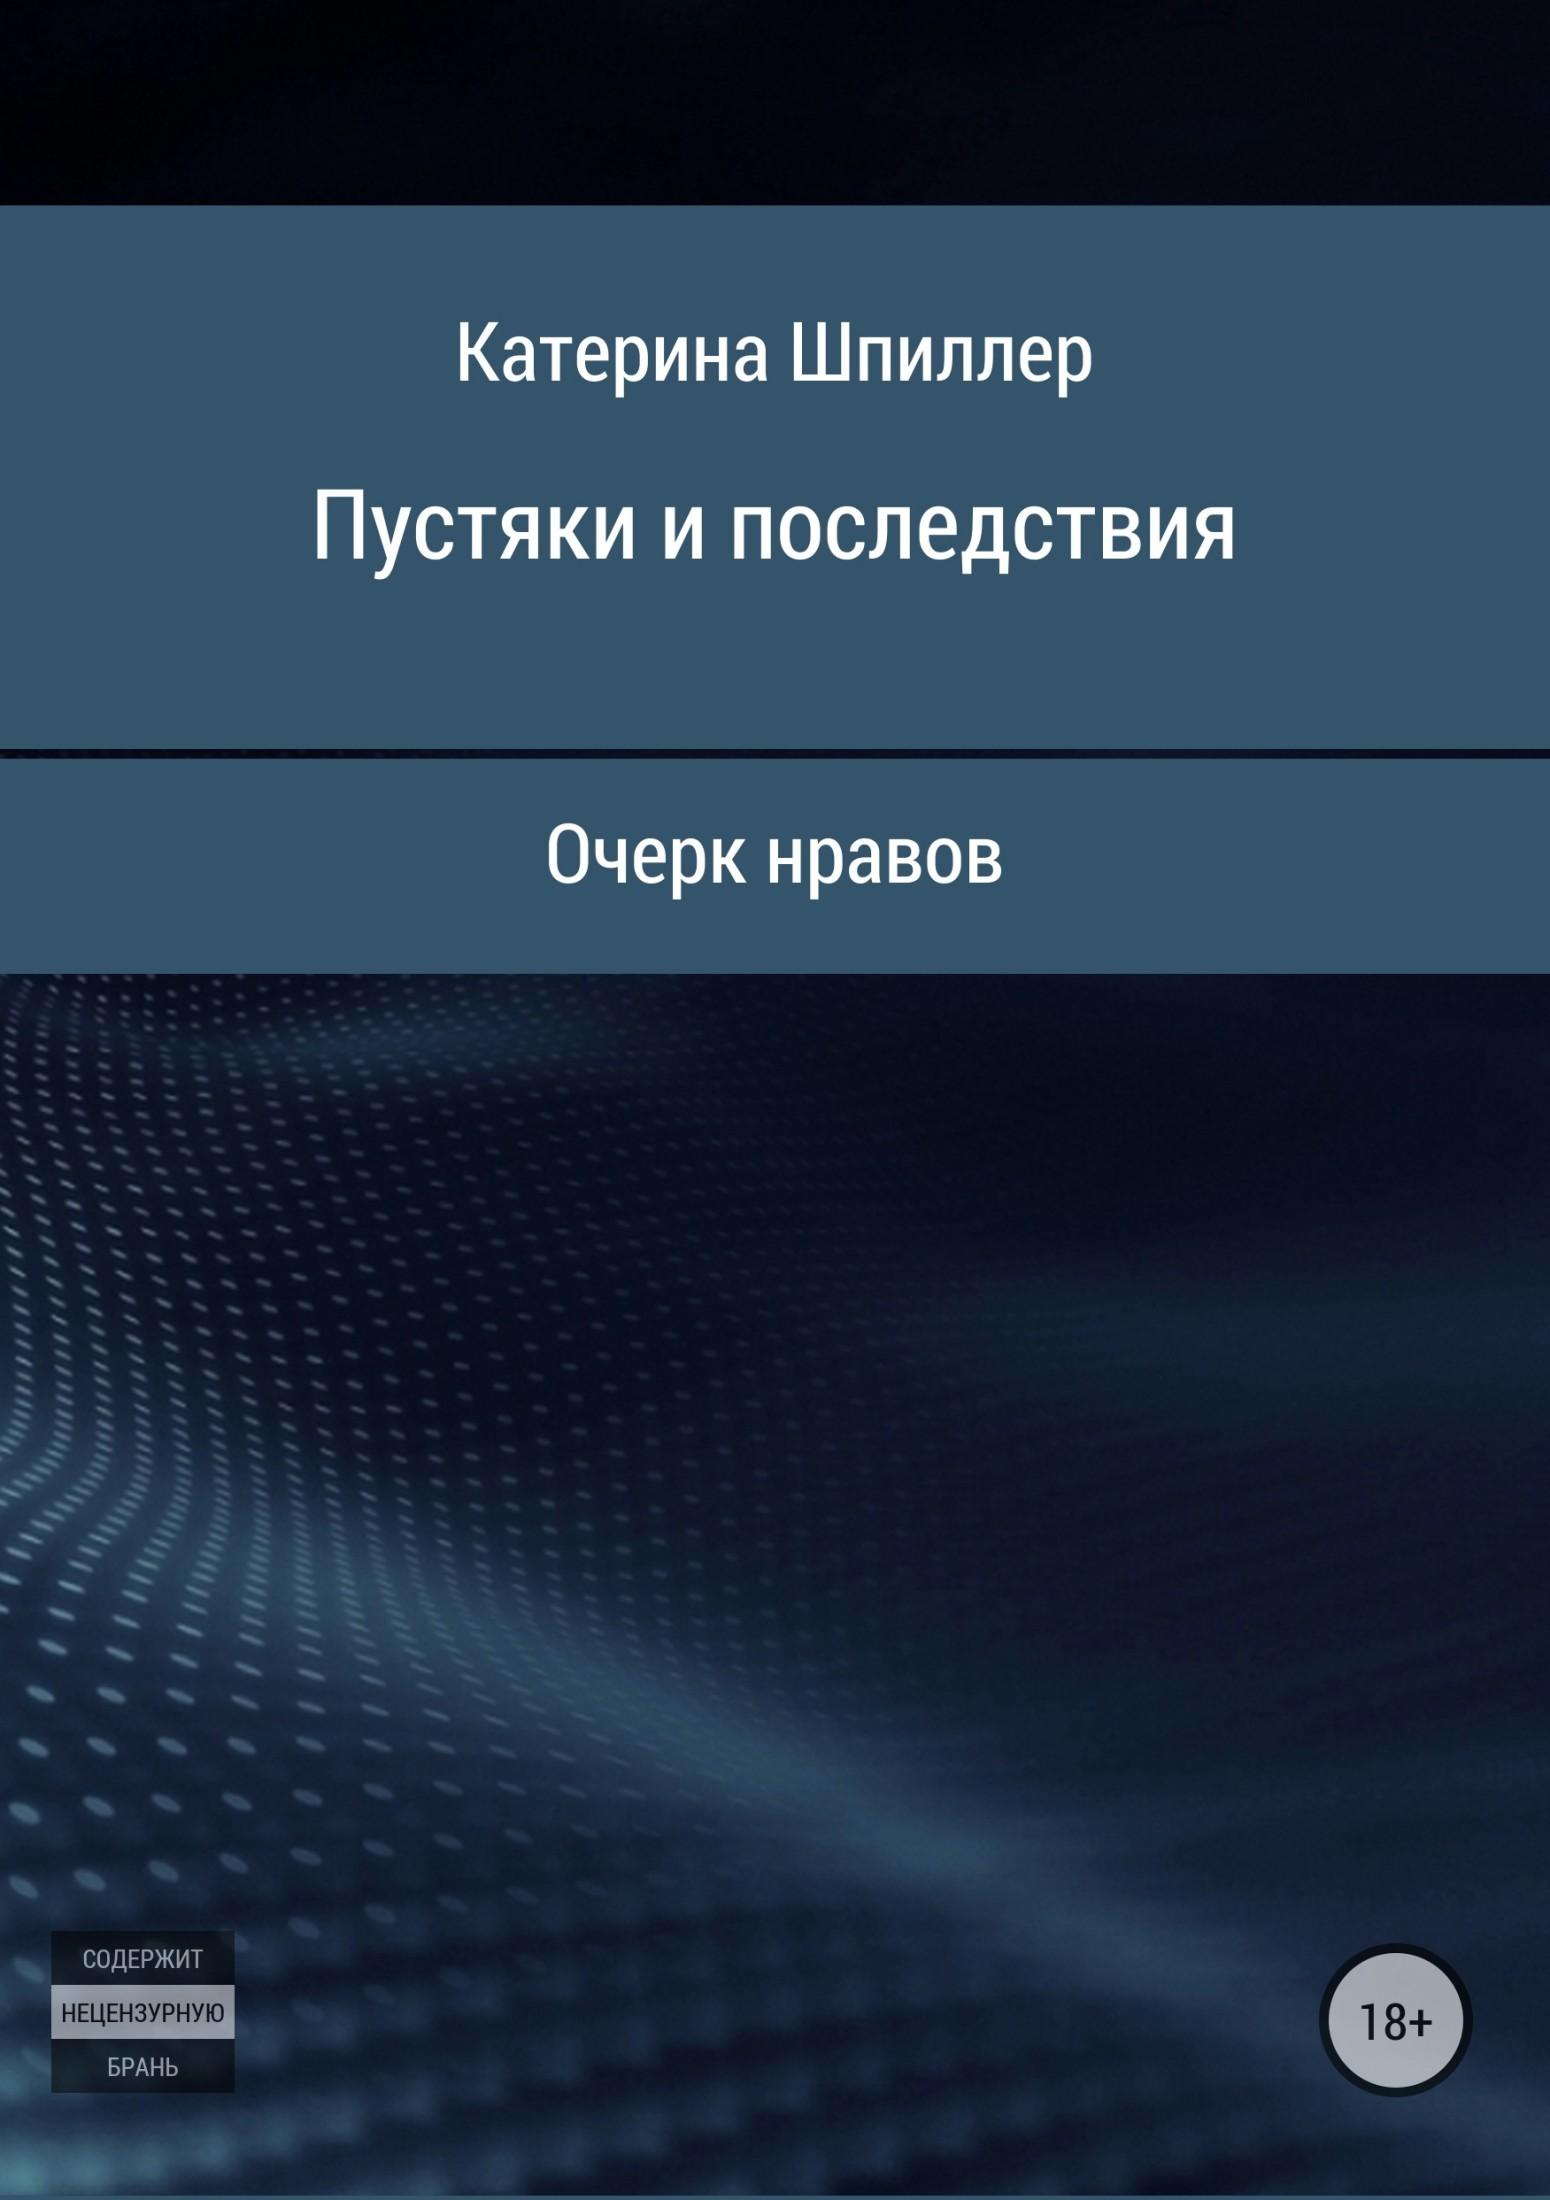 Пустяки и последствия_Катерина Александровна Шпиллер